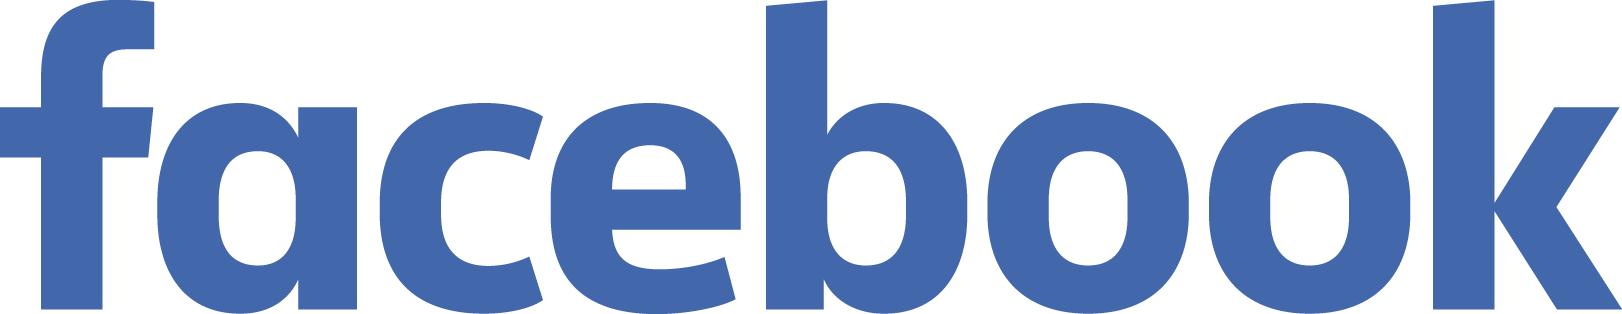 Facebook-06-2015-Blue-trans.png